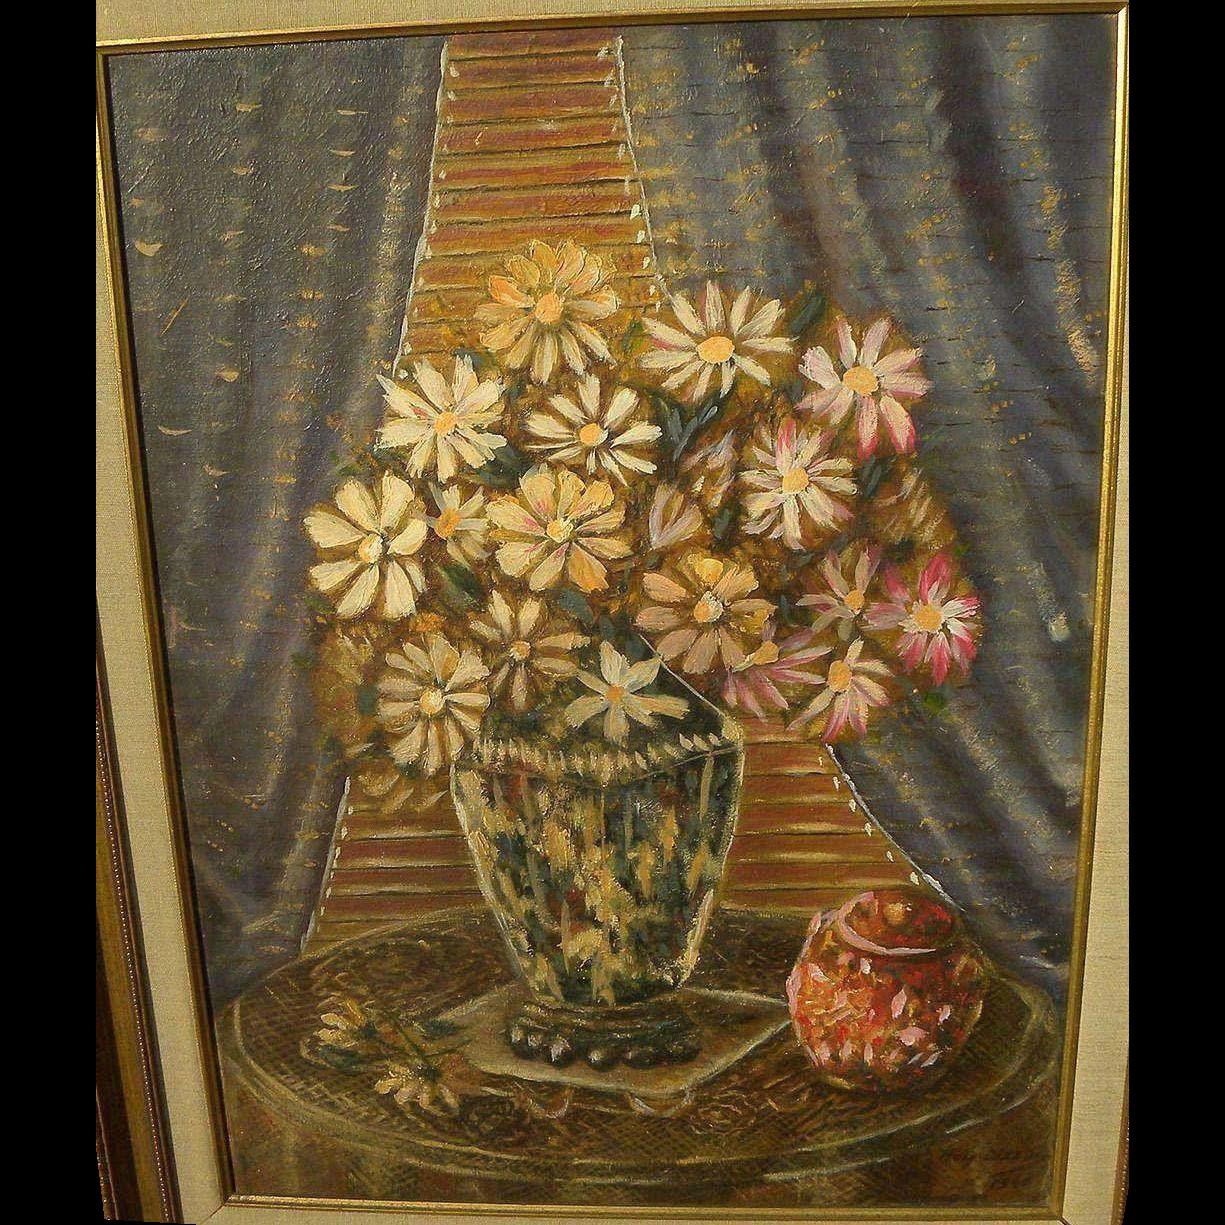 Modernist still life painting dated 1940 signed Haig Altoun